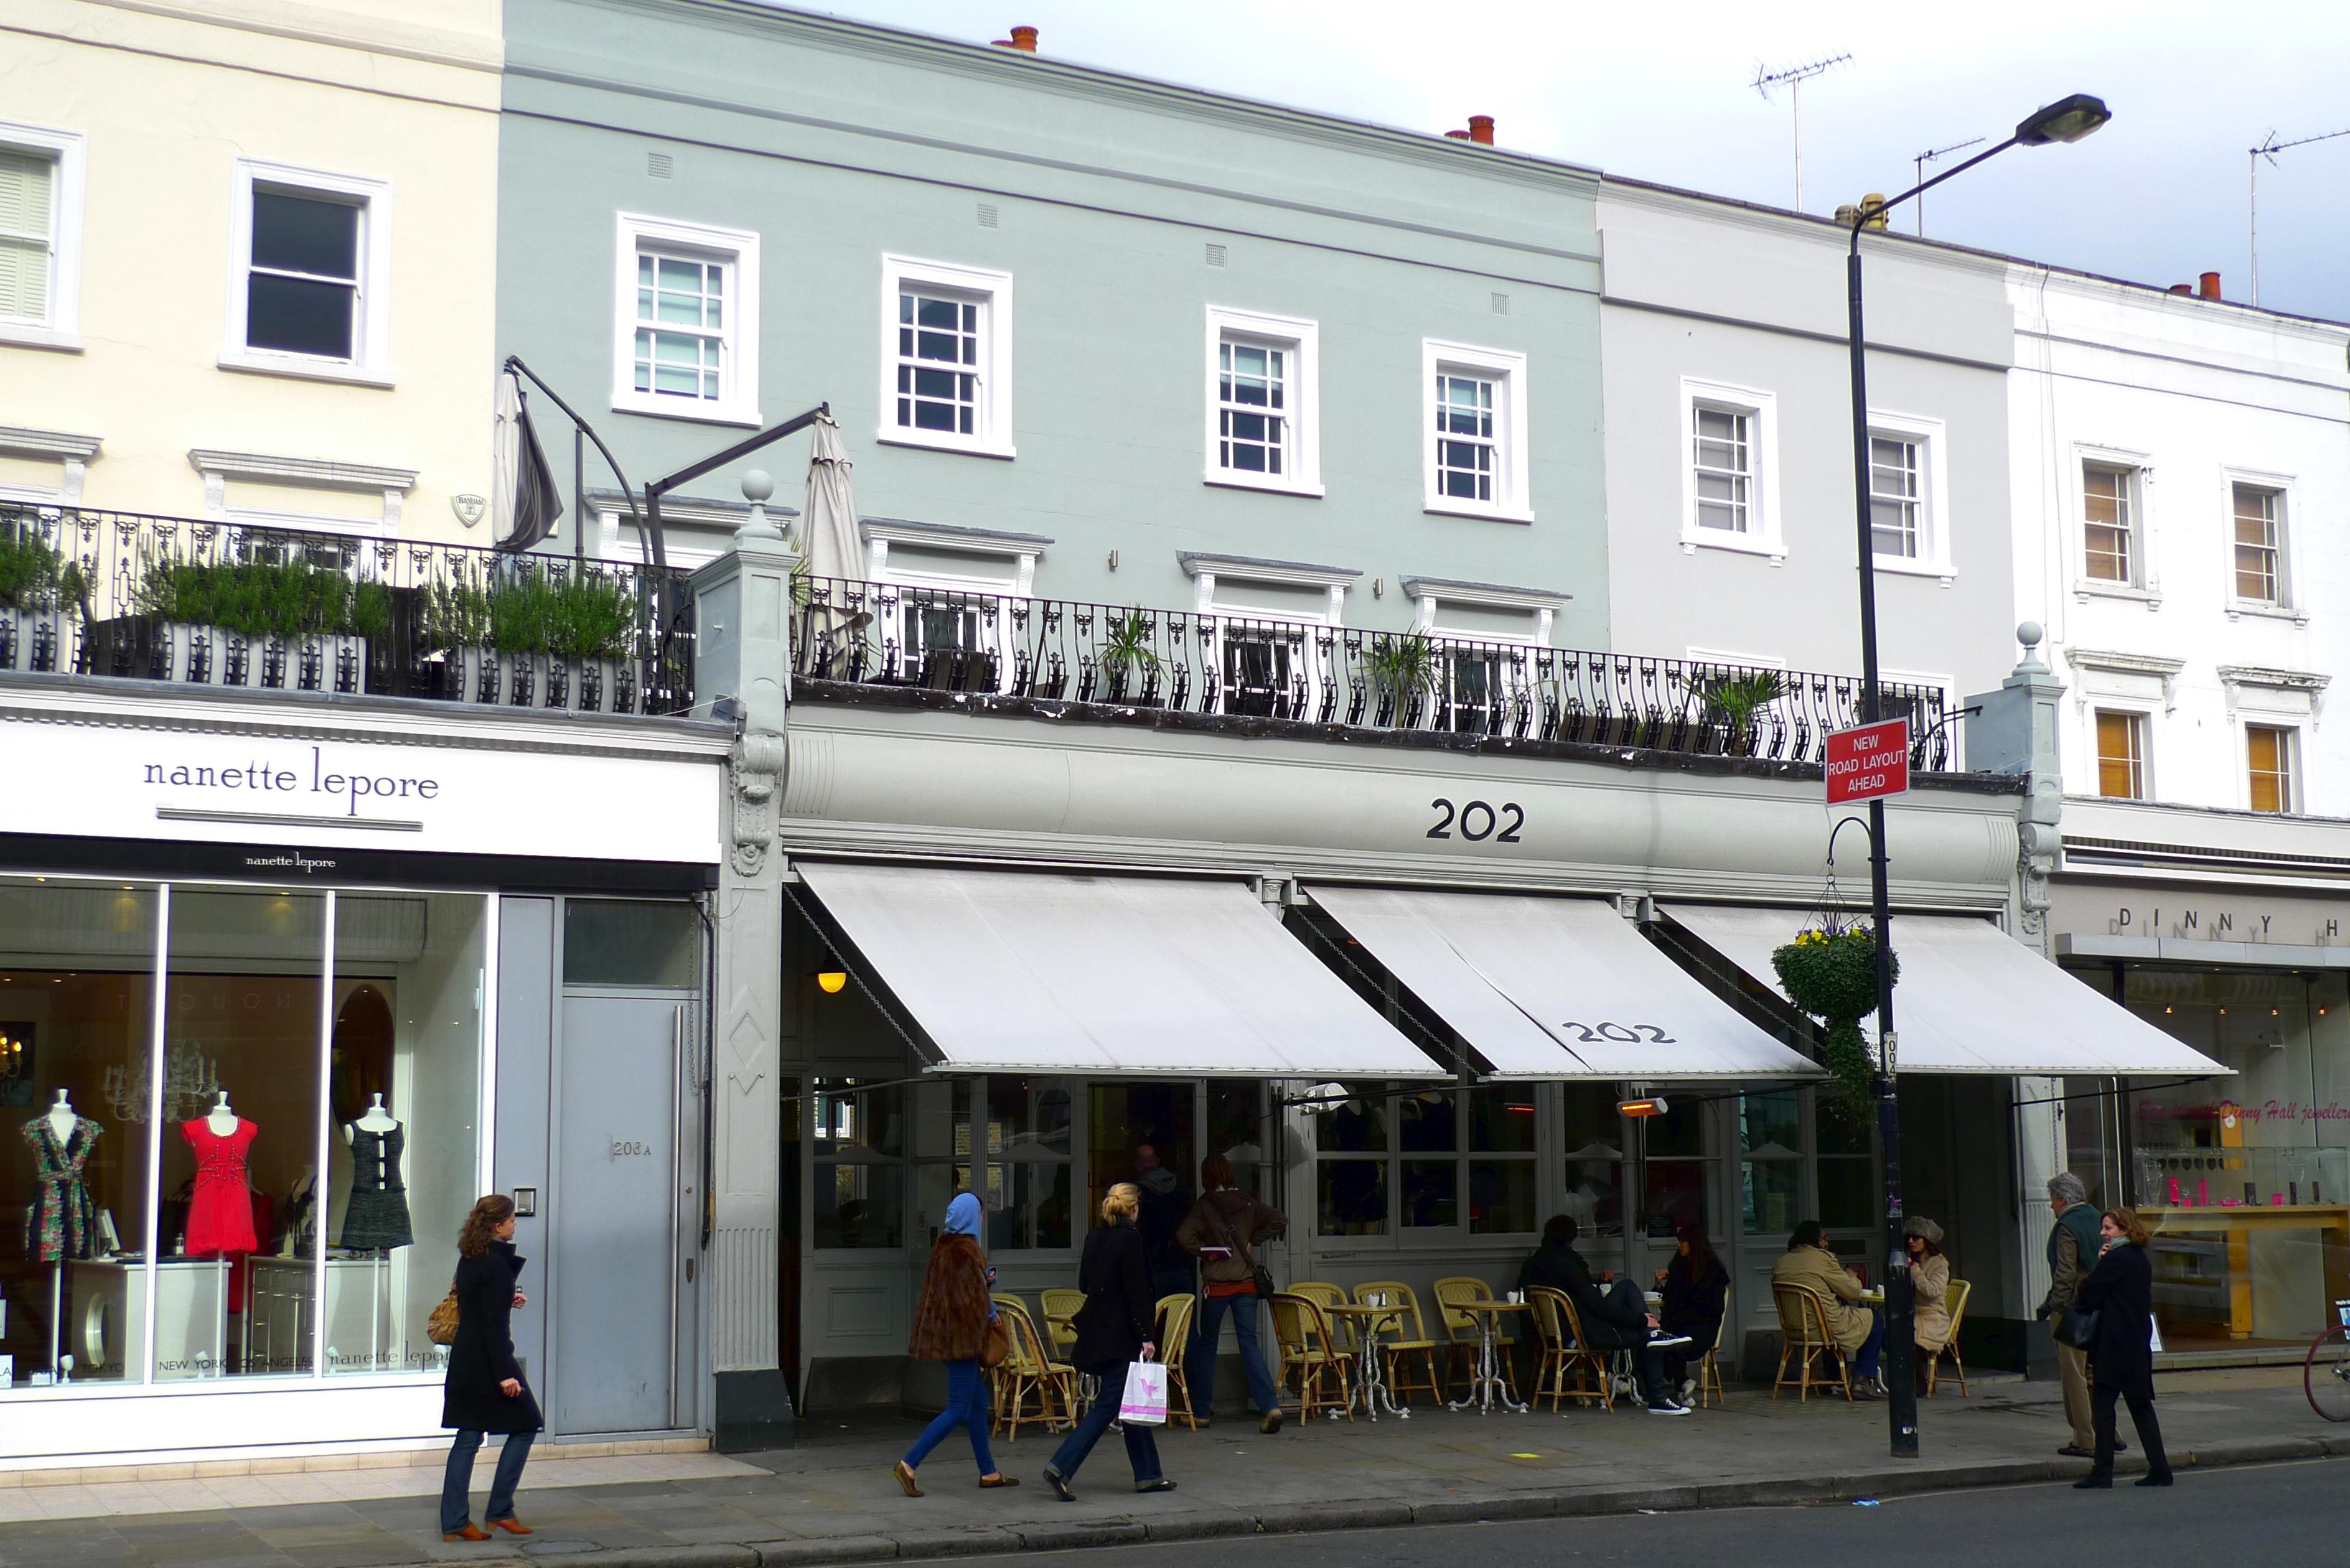 Notting Hill Ladbroke Grove file:202, notting hill, w11 (5499135012) - wikimedia commons